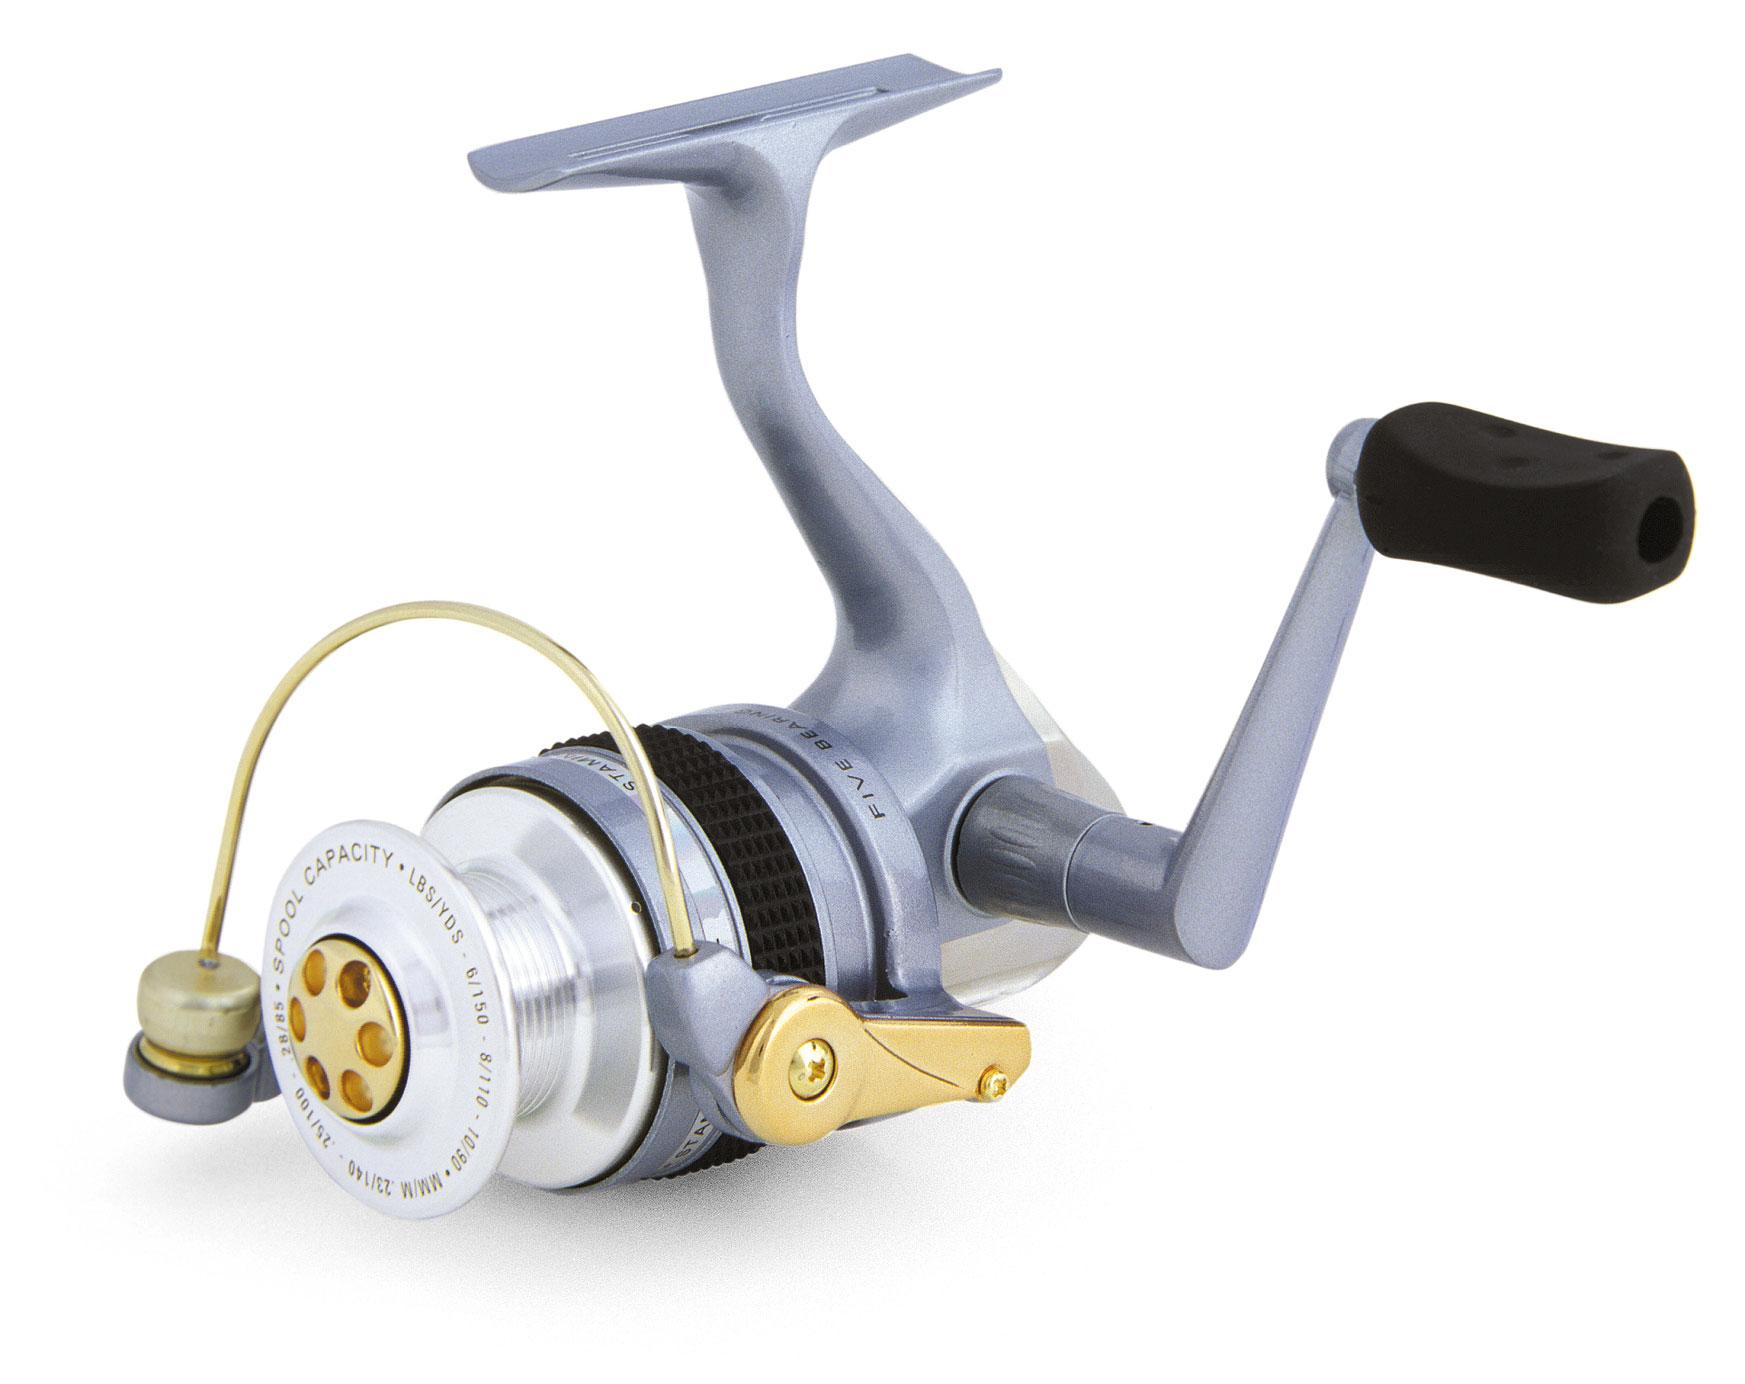 Abu garcia cardinal 600u spinning reel leland upgrade ebay for Abu garcia fishing reels